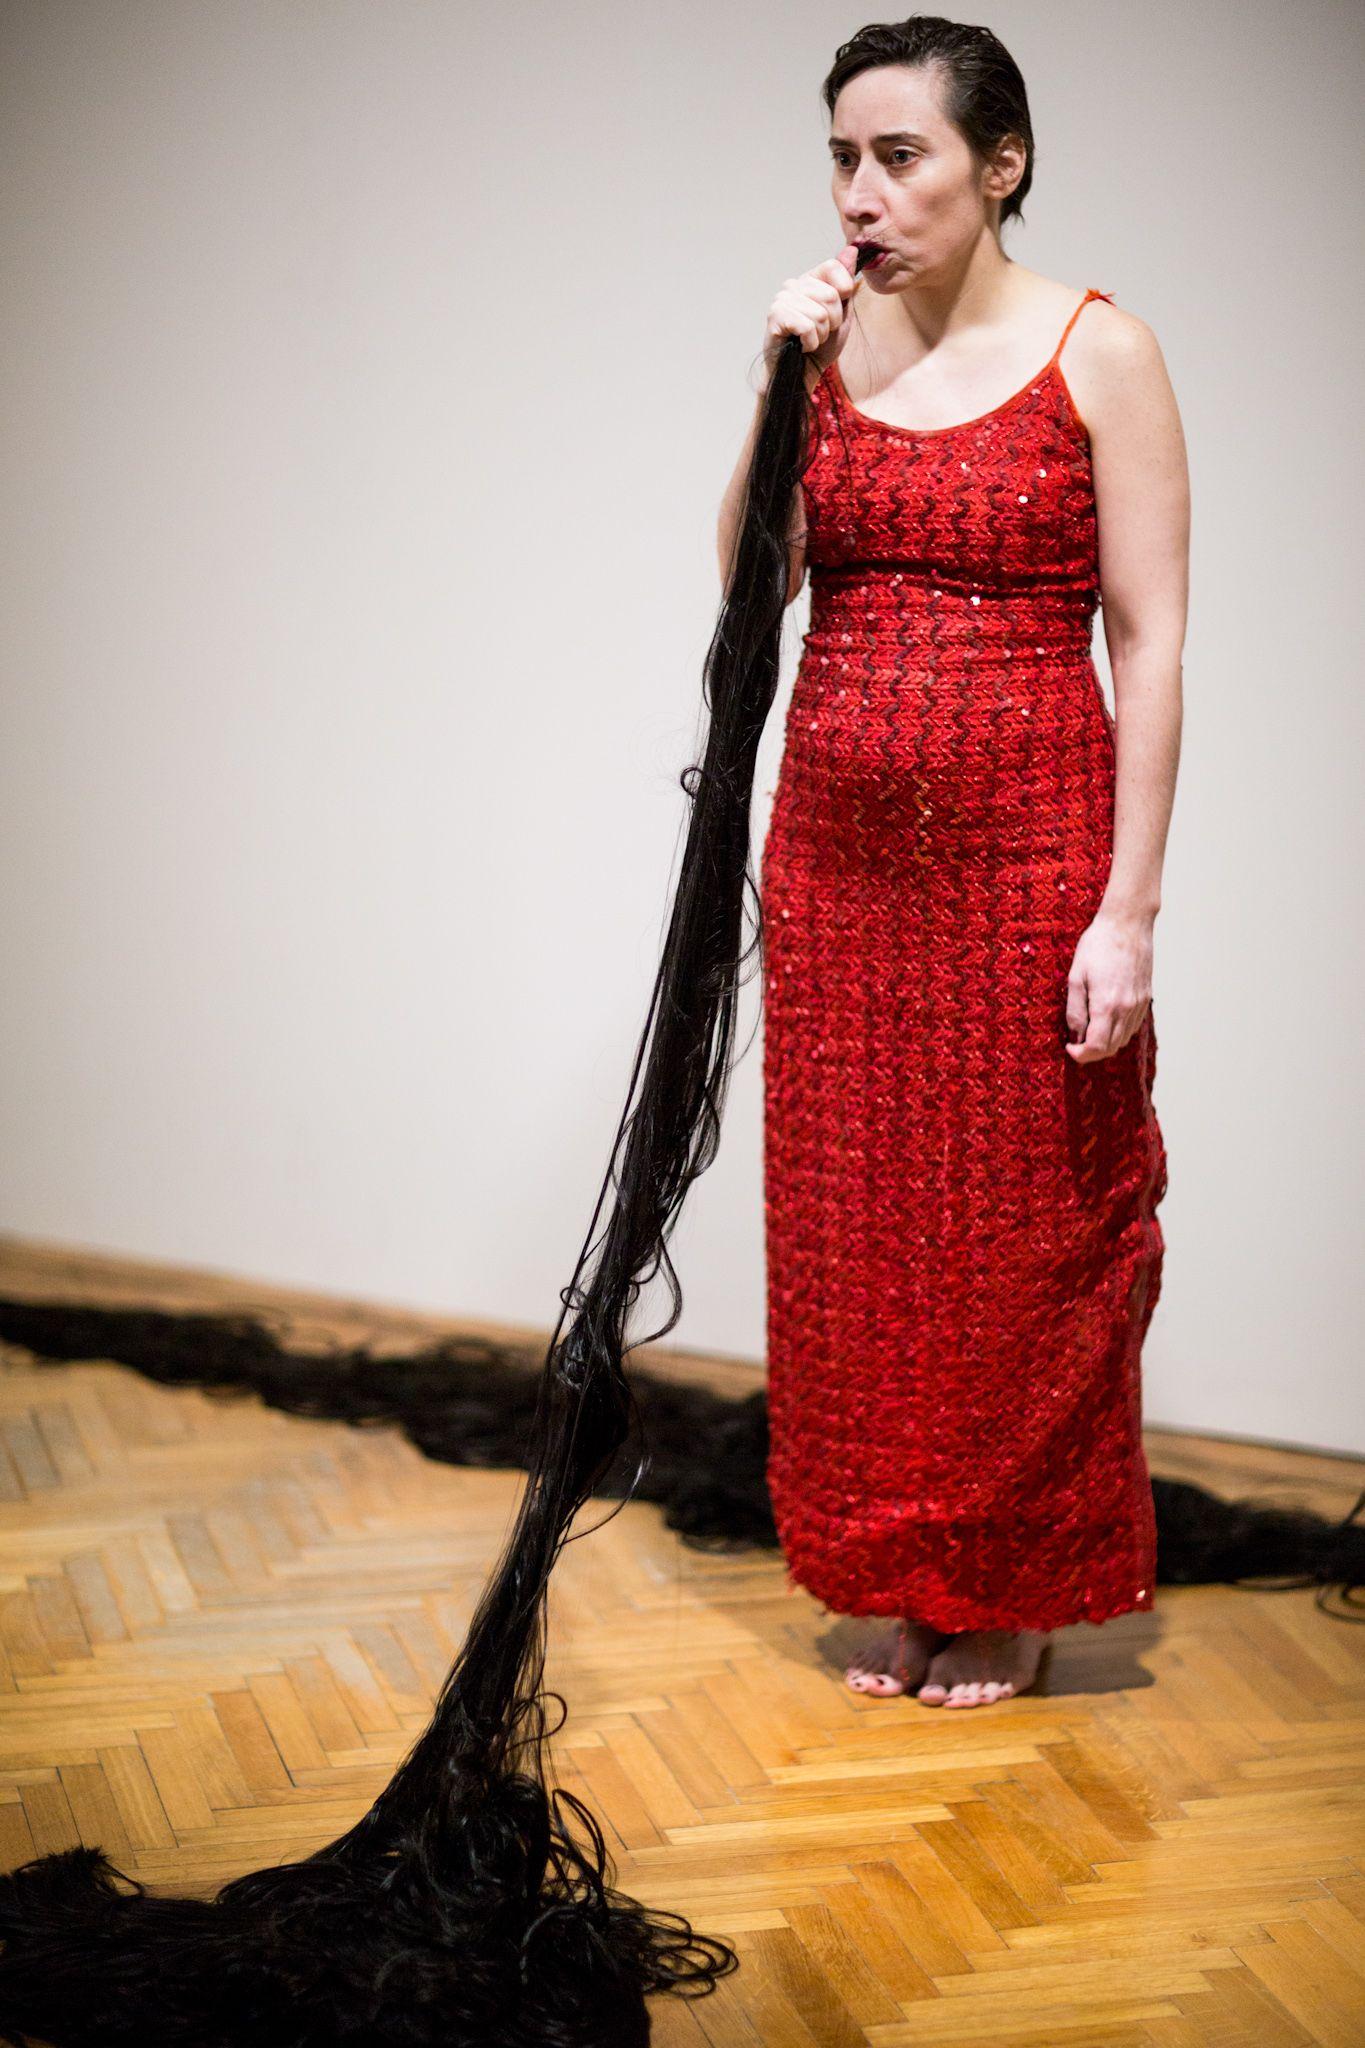 Helena Goldwater, Venice International Performance Art Week 2012